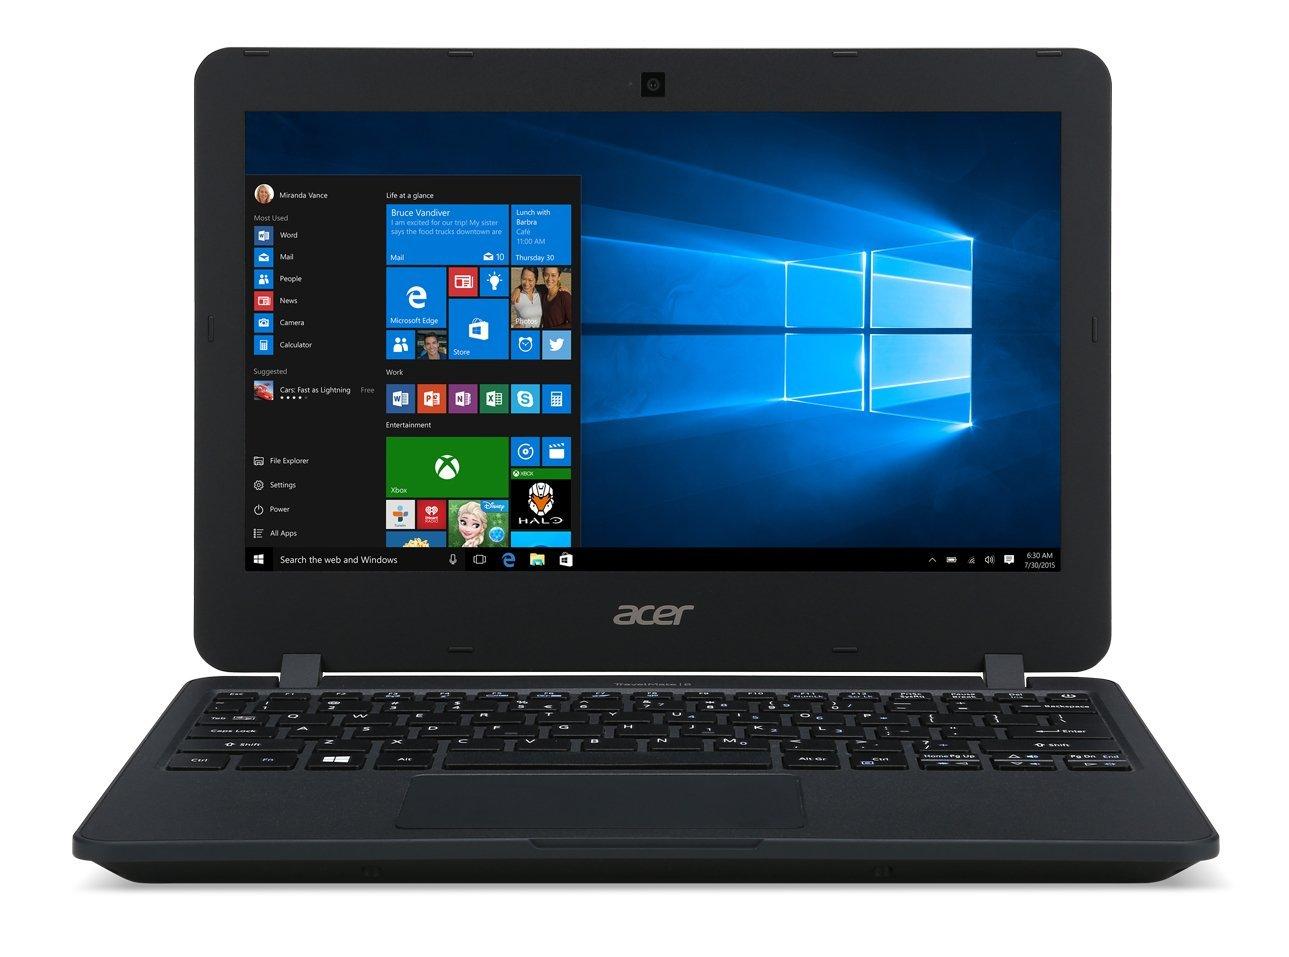 acer-high-performance-116inch-hd-laptop-intel-celeron-processor-4gb-ram-64gb-storage-intel-hd-graphics-wifi-bluetooth-hdmi-win10-pro-renewed